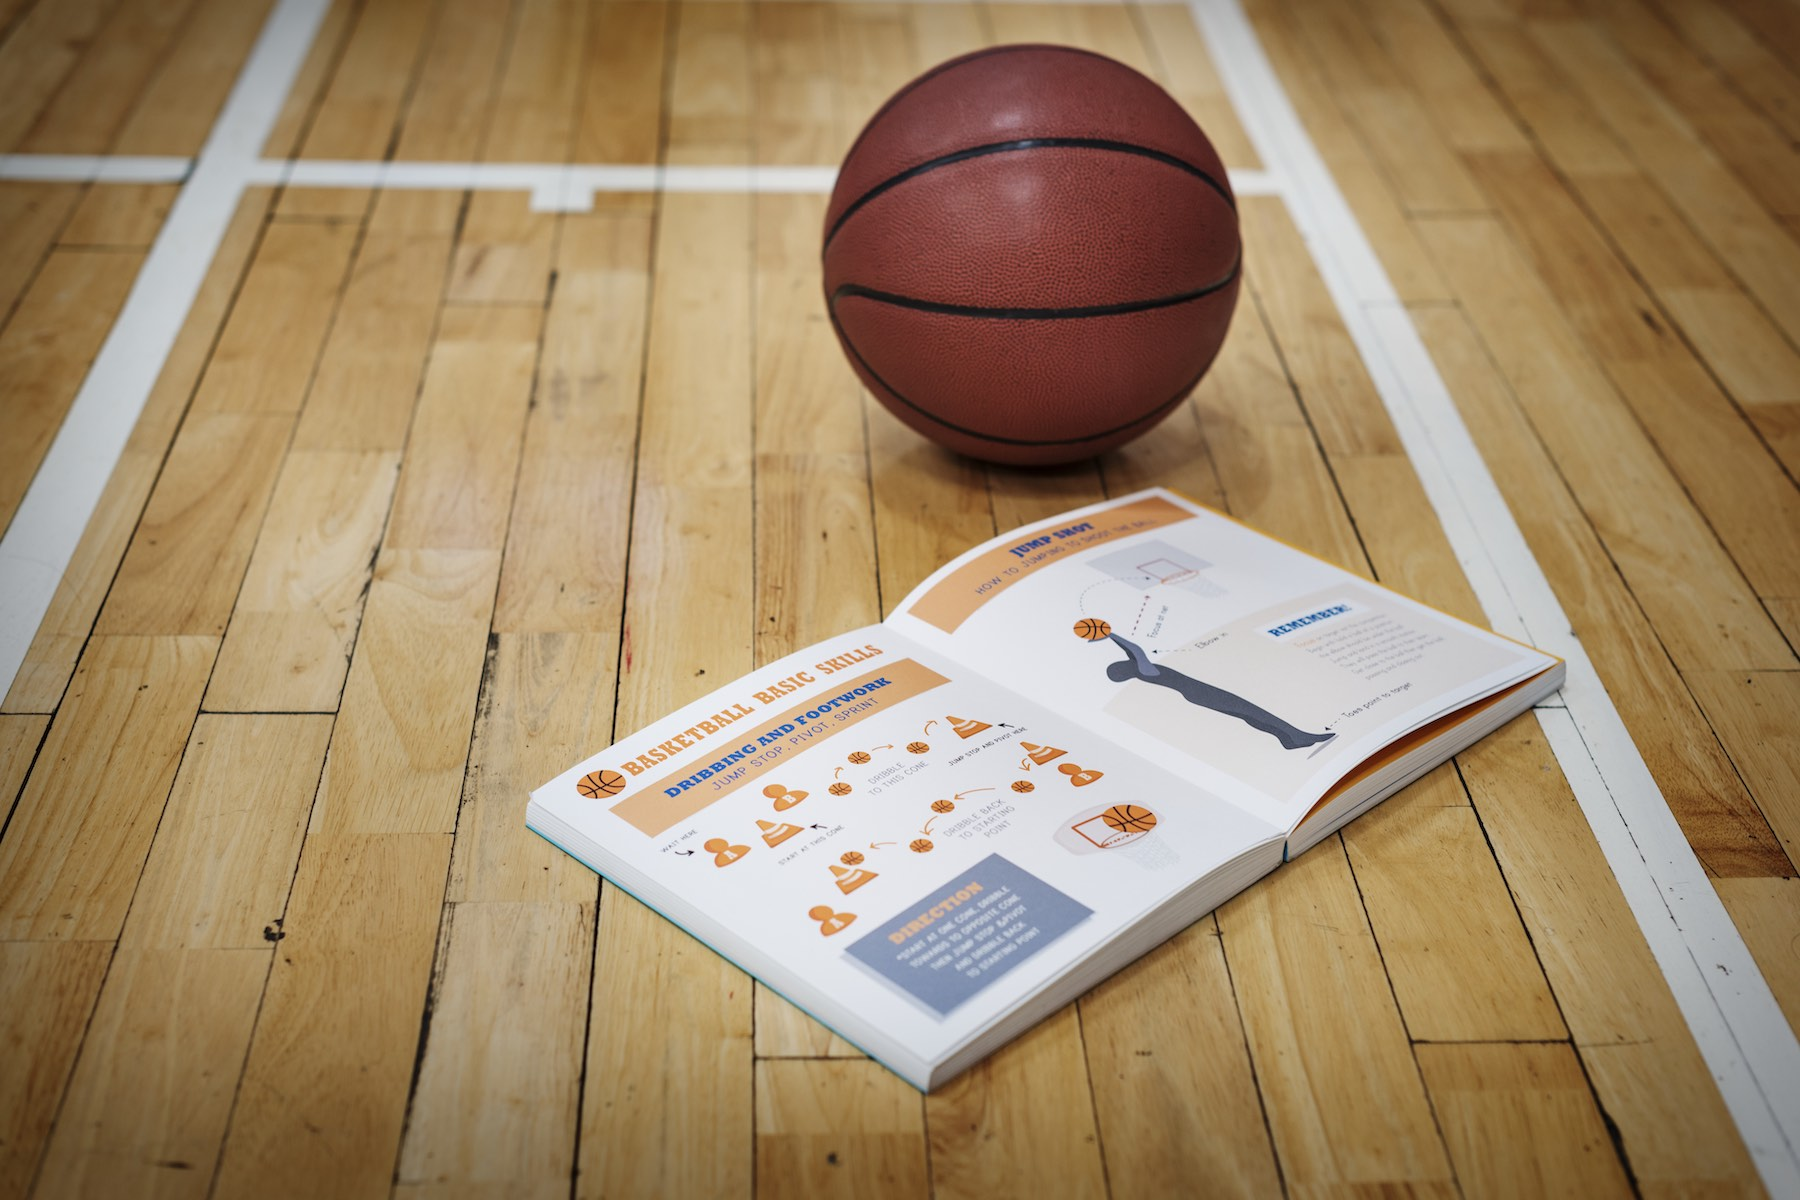 Basketball books